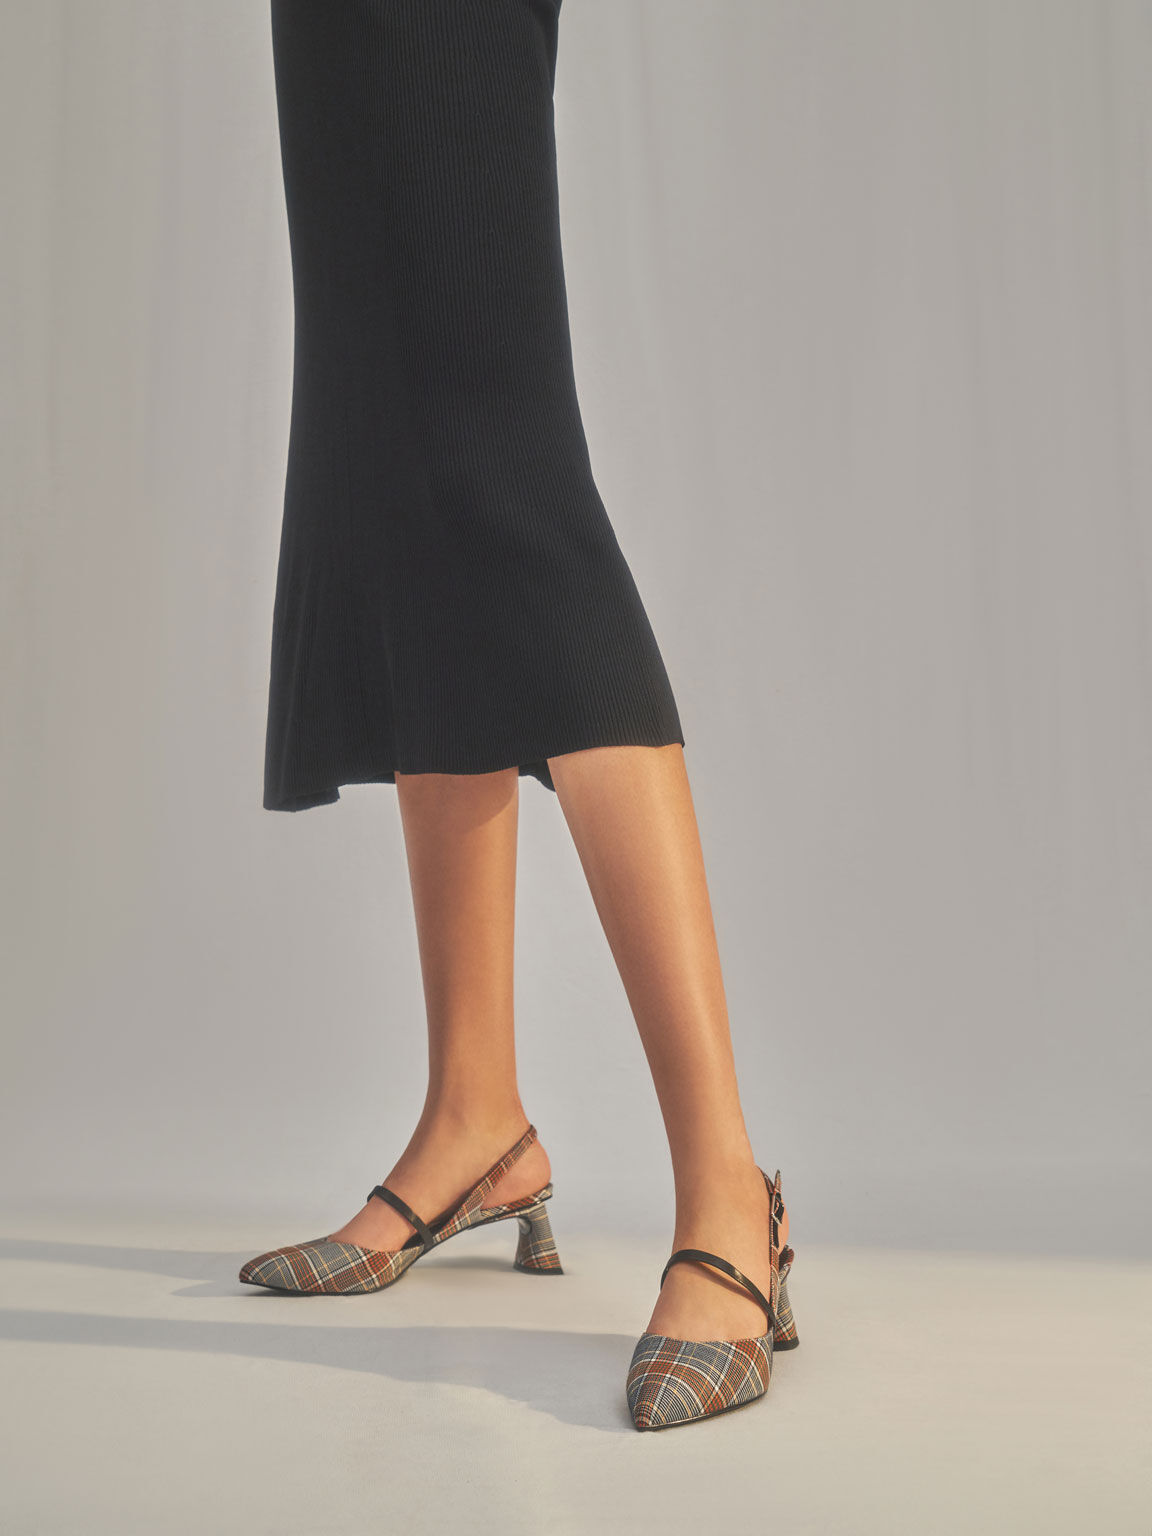 Check Print Sculptural Heel Slingback Mary Janes, Grey, hi-res